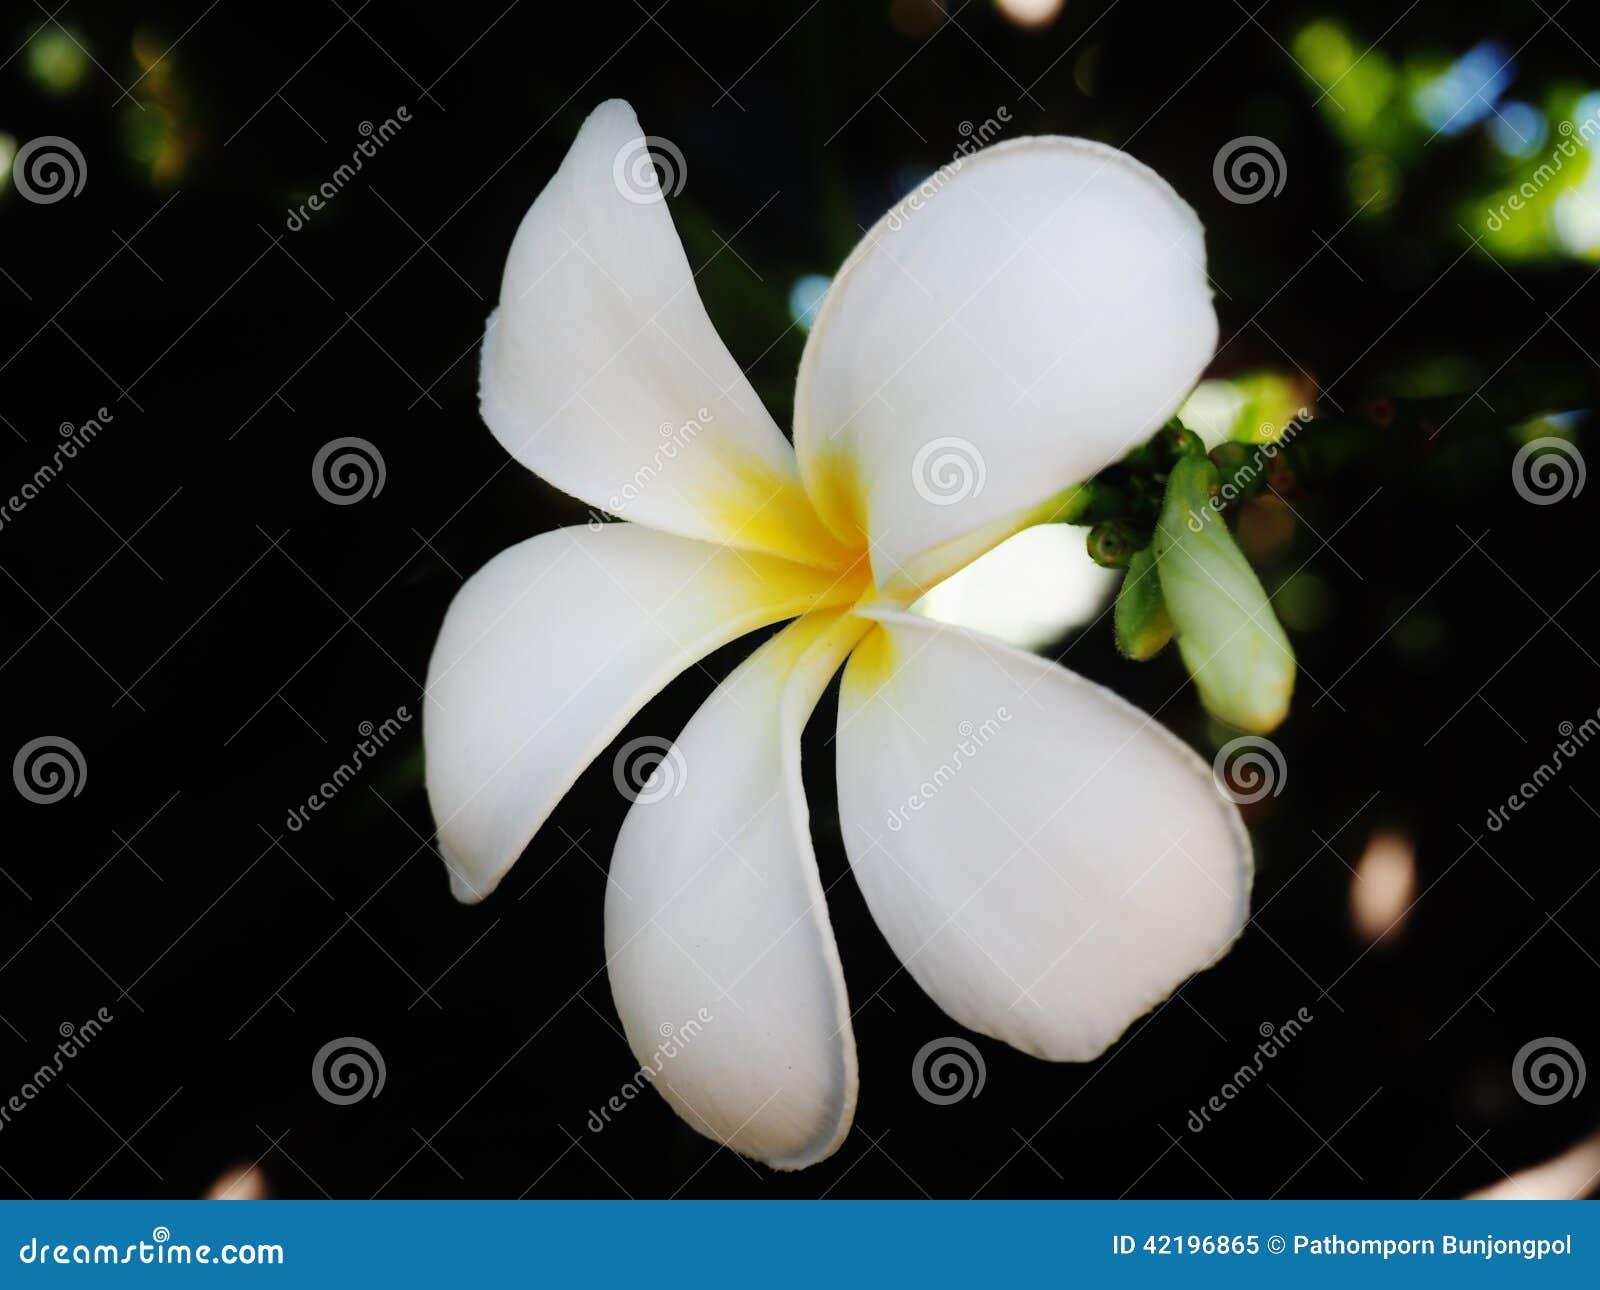 White flower stock image image of wallpaper yellow 42196865 white flower mightylinksfo